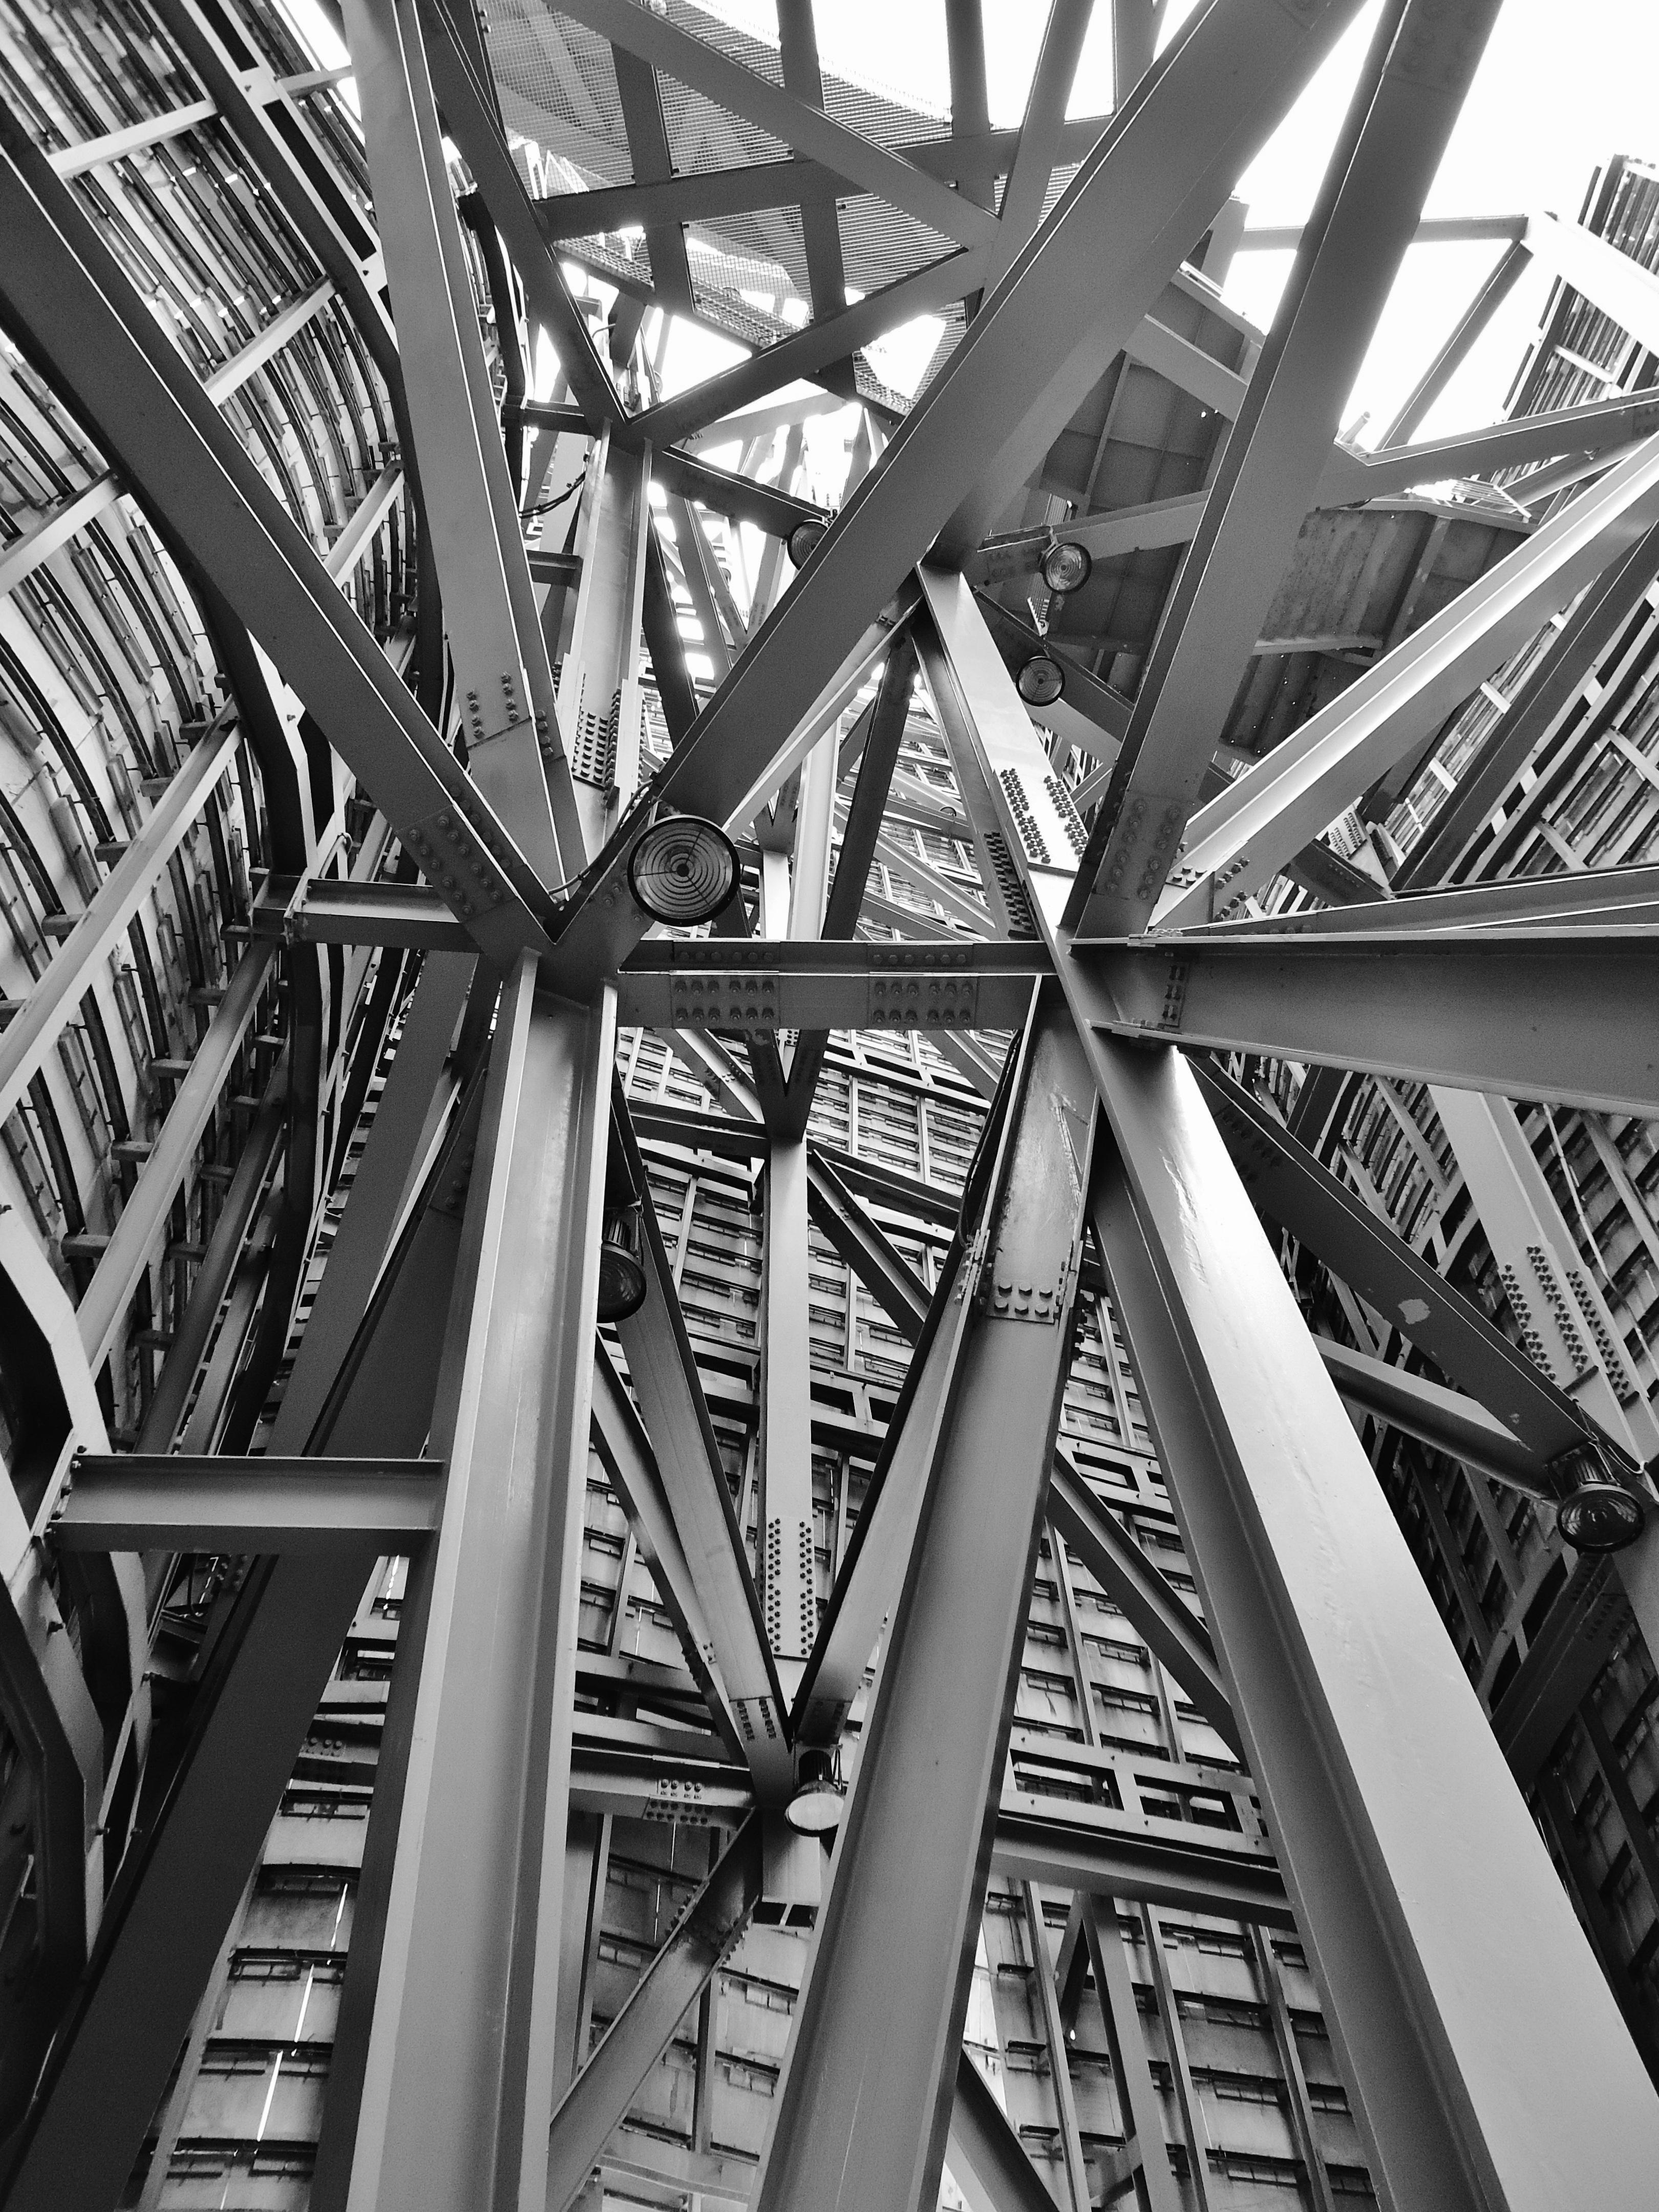 Black And White Architecture Building Skyscraper Steel Line Contrast Monochrome Design Symmetry Iron Shape